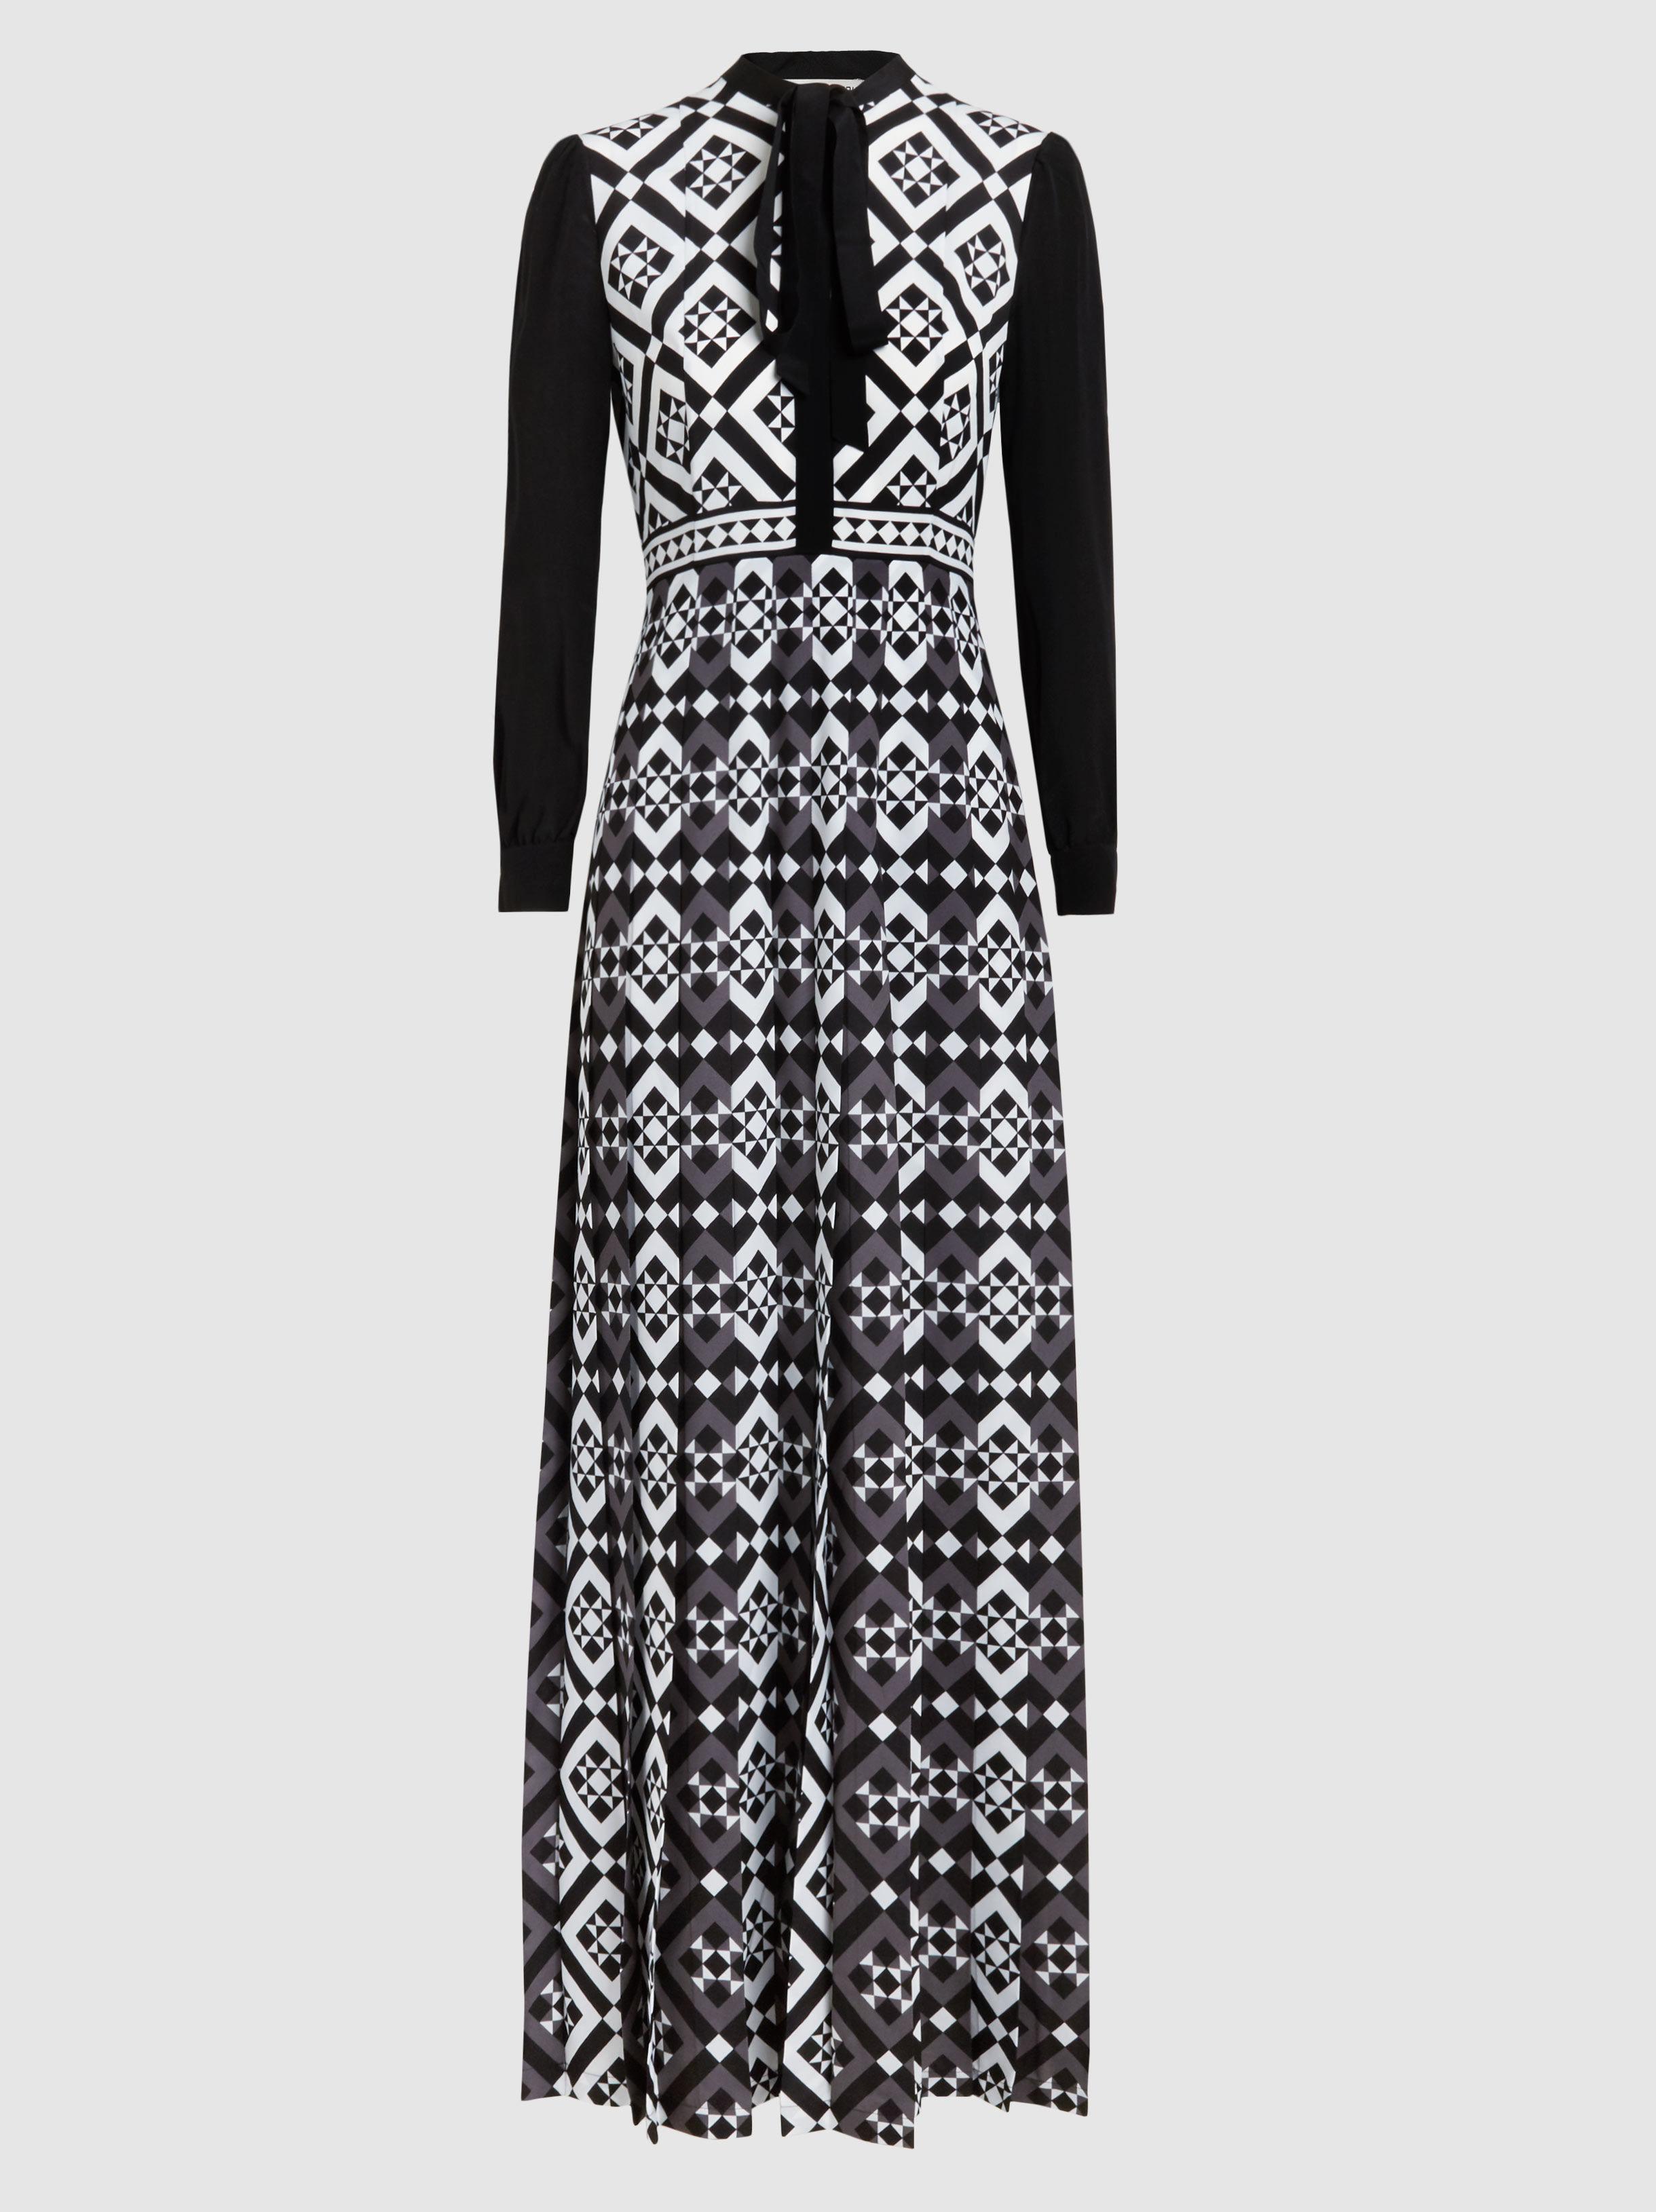 cf3eafe407ba Mary Katrantzou. Women's Black Duritz Tile Print Crepe De Chine Dress